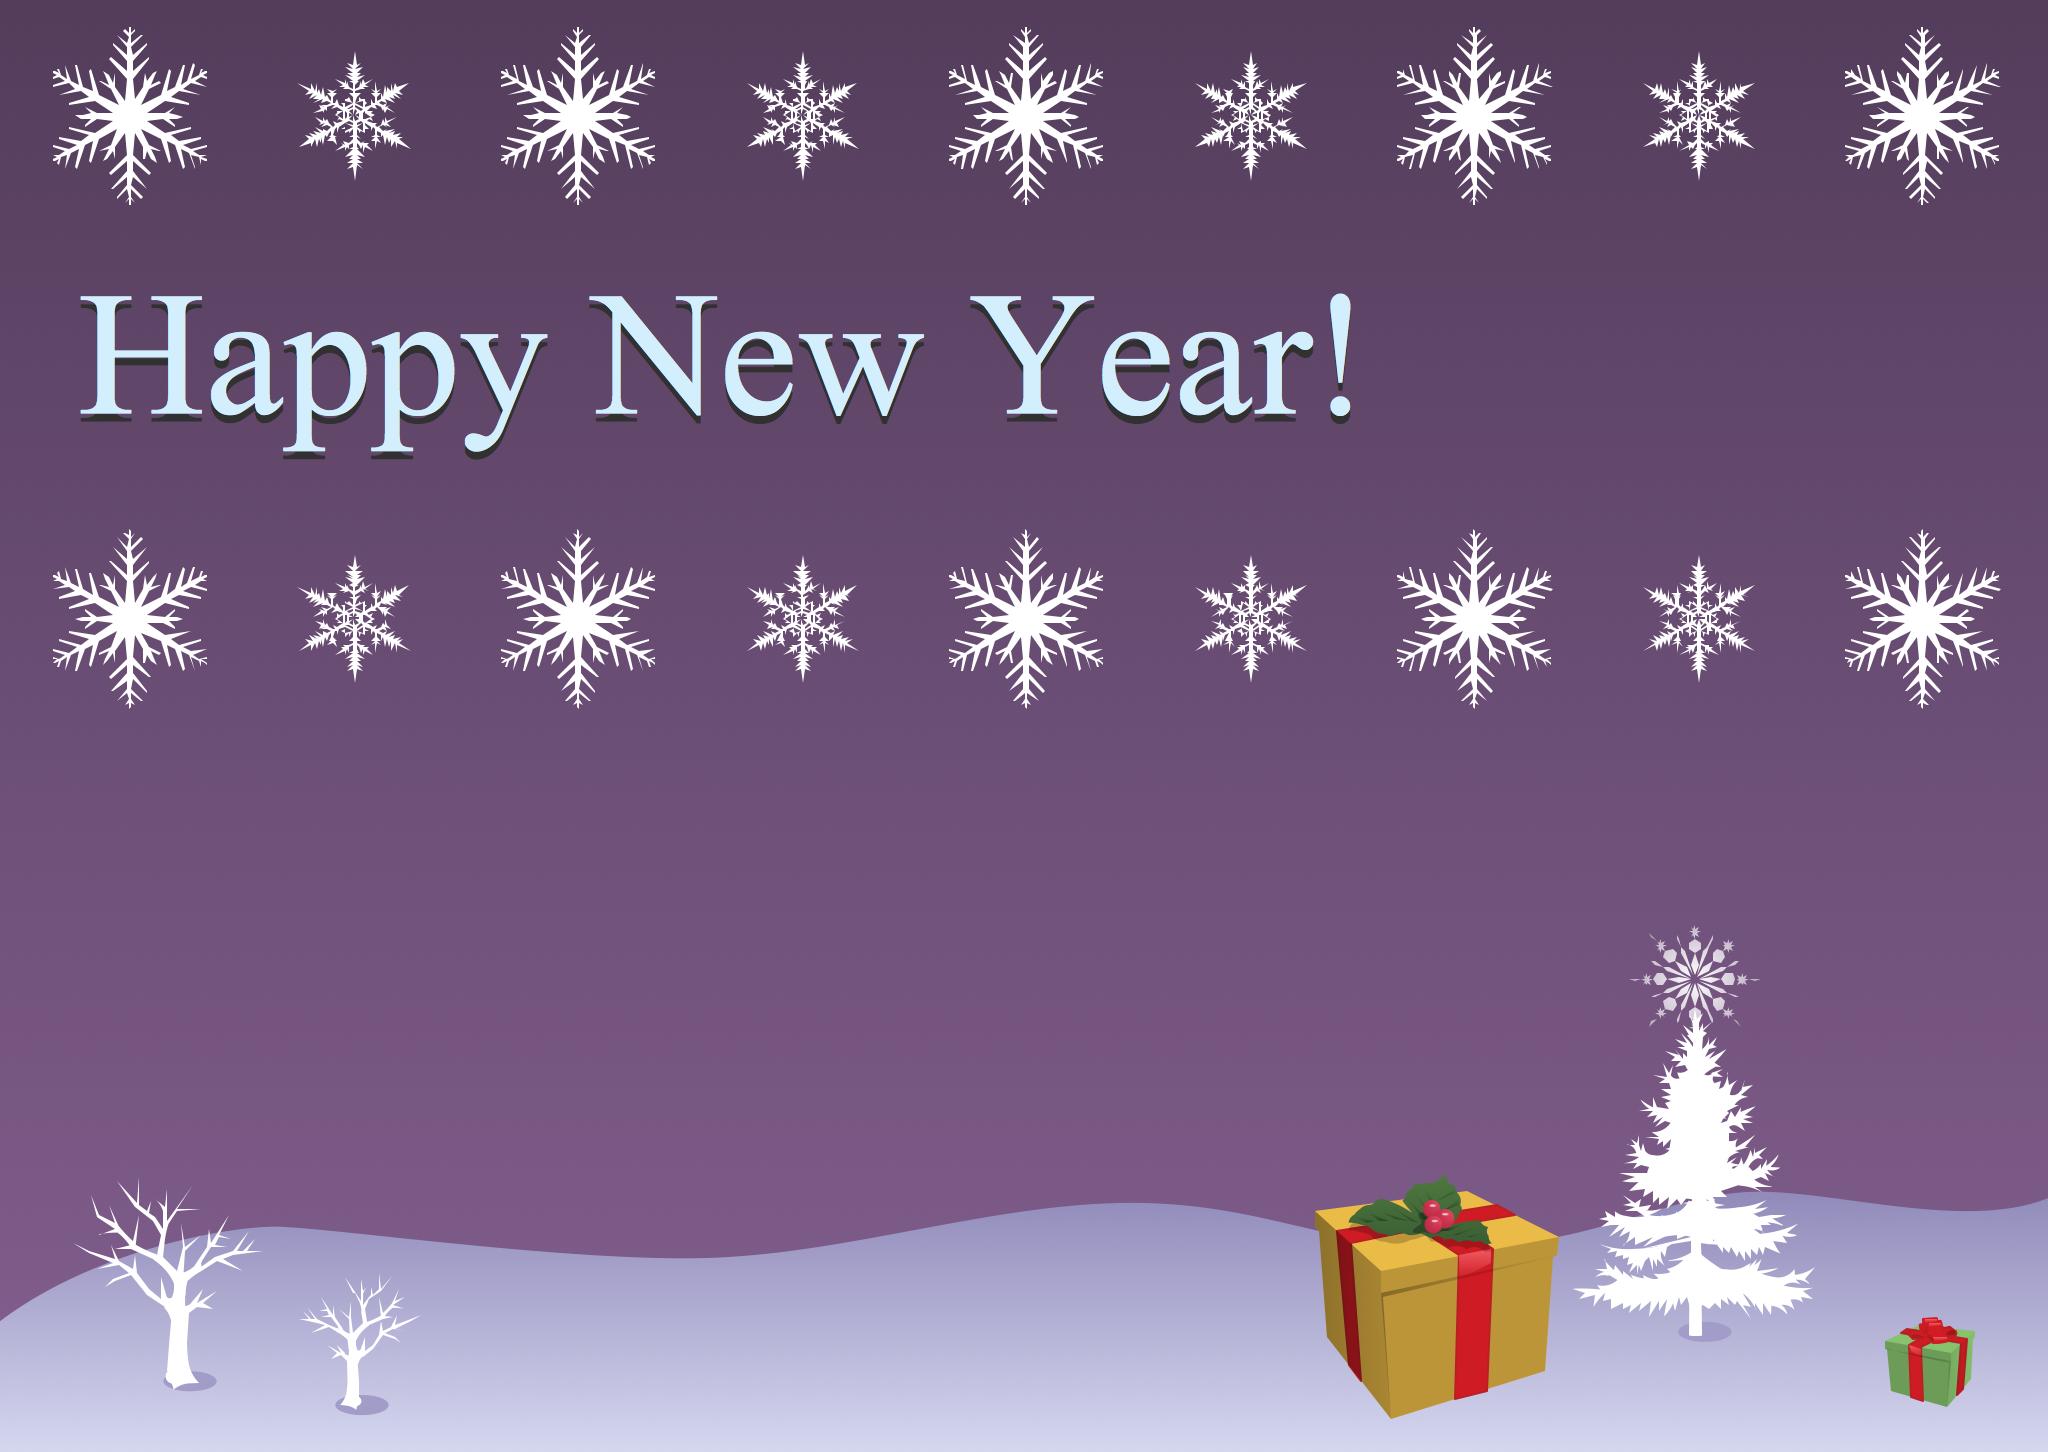 Illustration holiday sample 2 christmas snowflakes and gifts kristyandbryce Choice Image